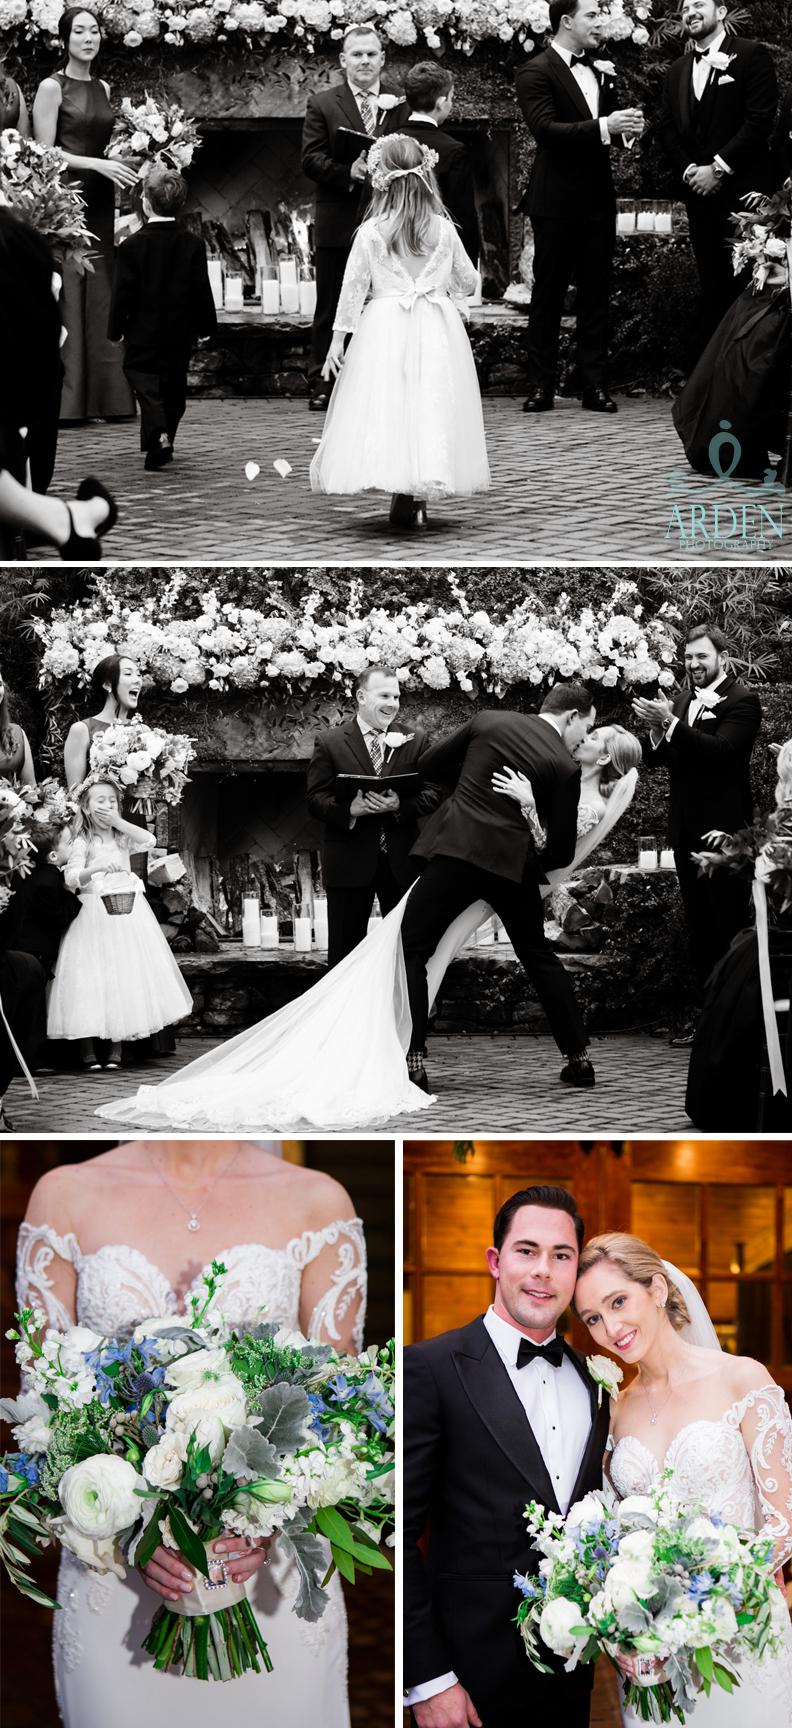 Winter wedding bliss.